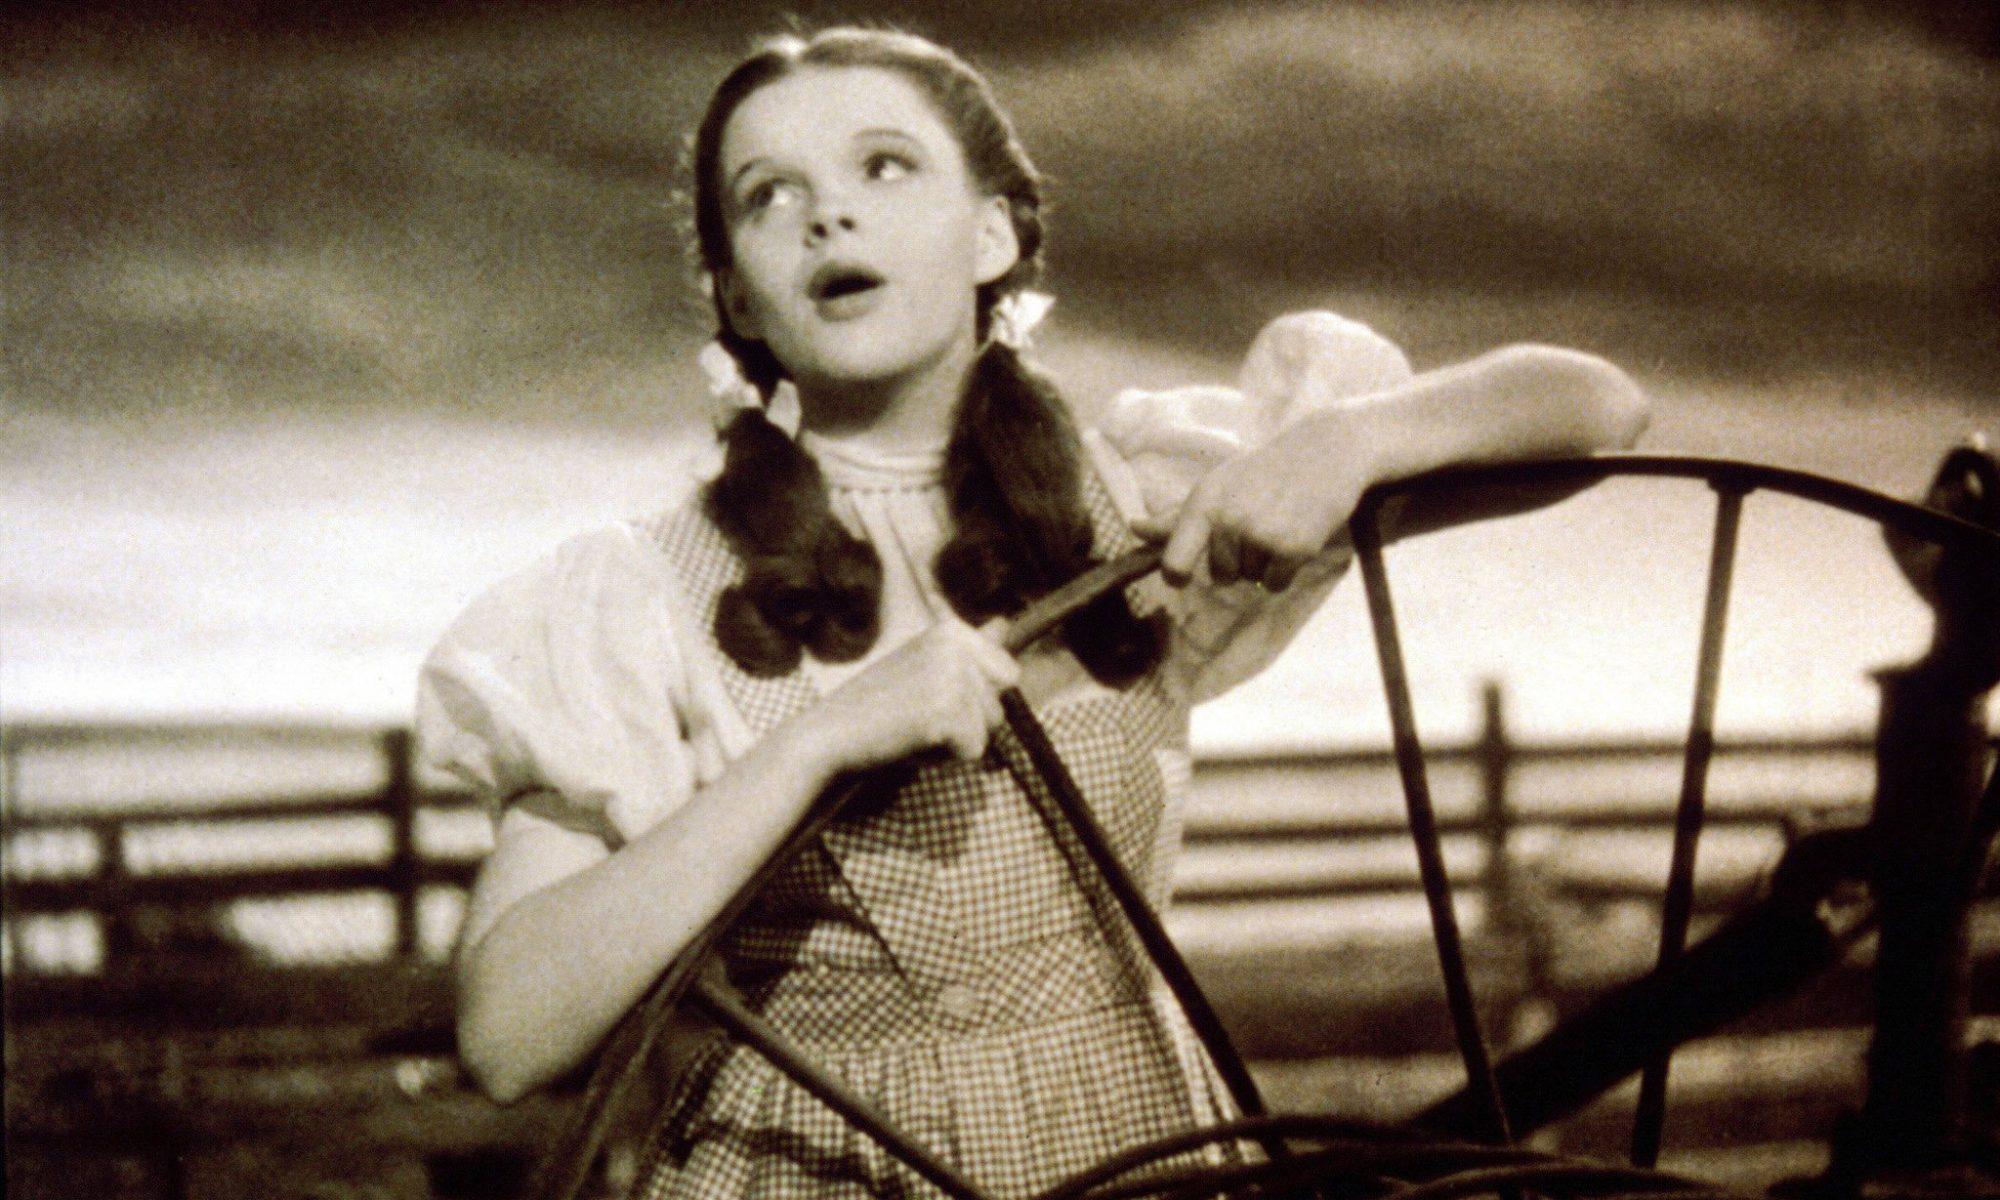 Judy Garland in Gingham